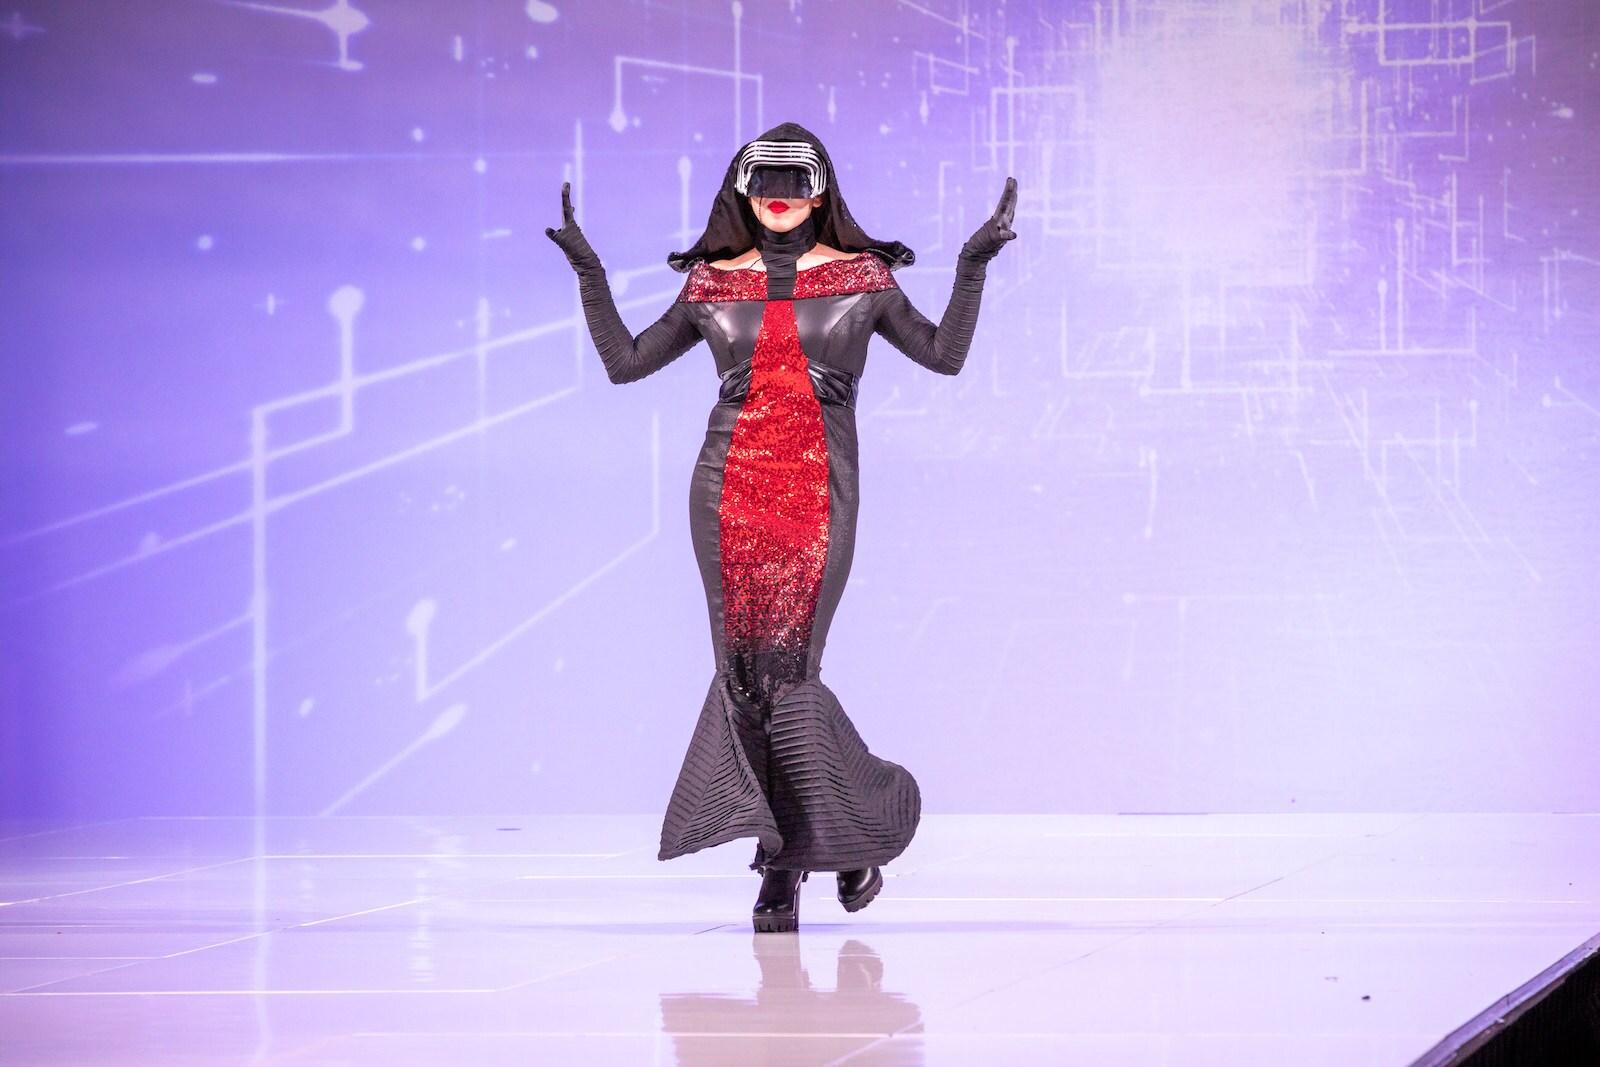 Her Universe - Star Wars inspired dress